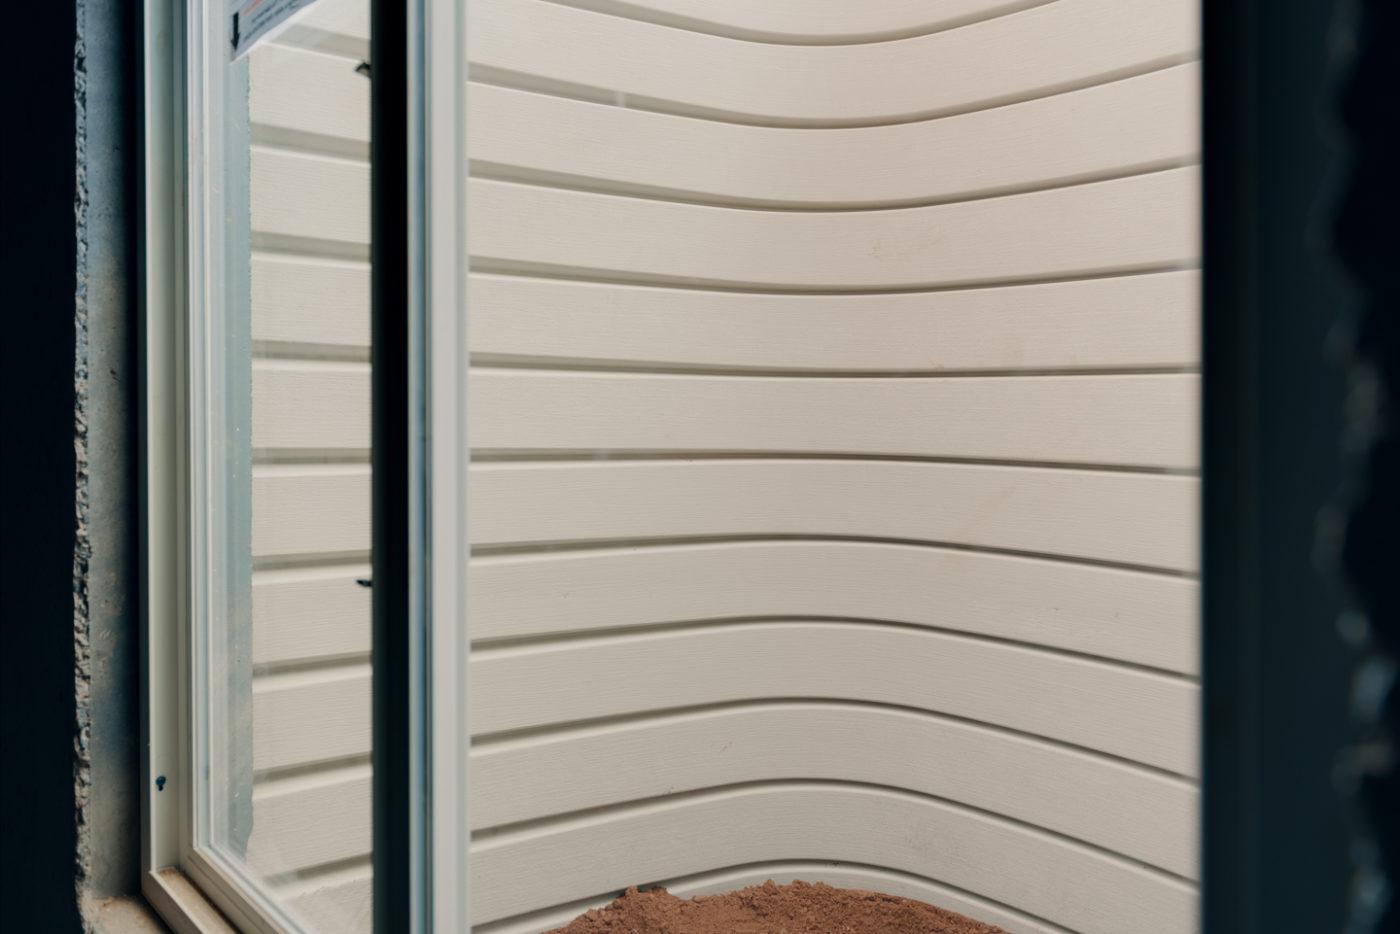 Shea window well from Rockwell Inc